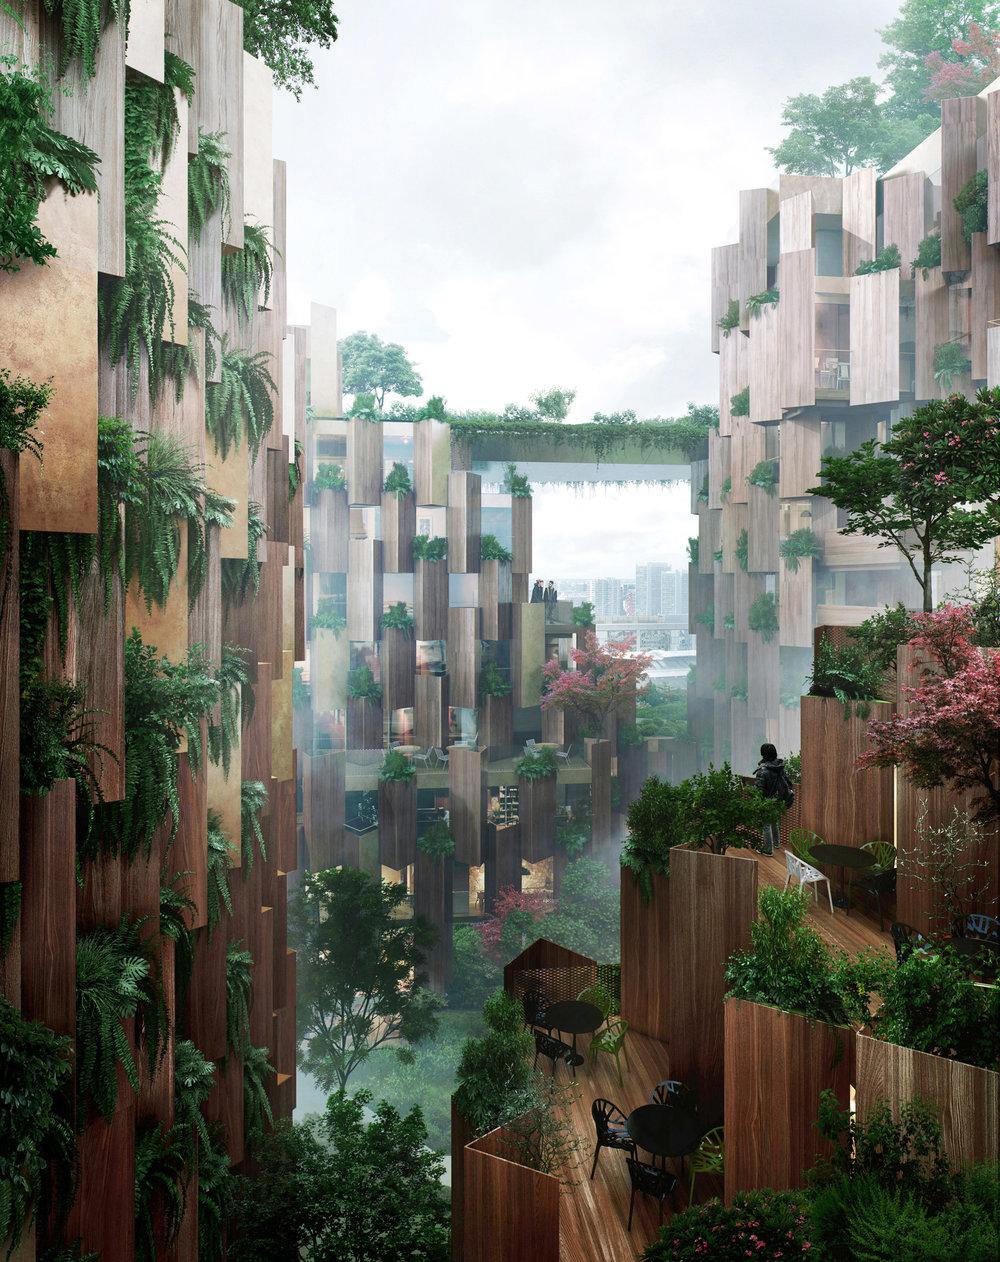 1-hotel-paris-kengo-kuma-associates-france-architecture-_dezeen_2364_col_11.jpg